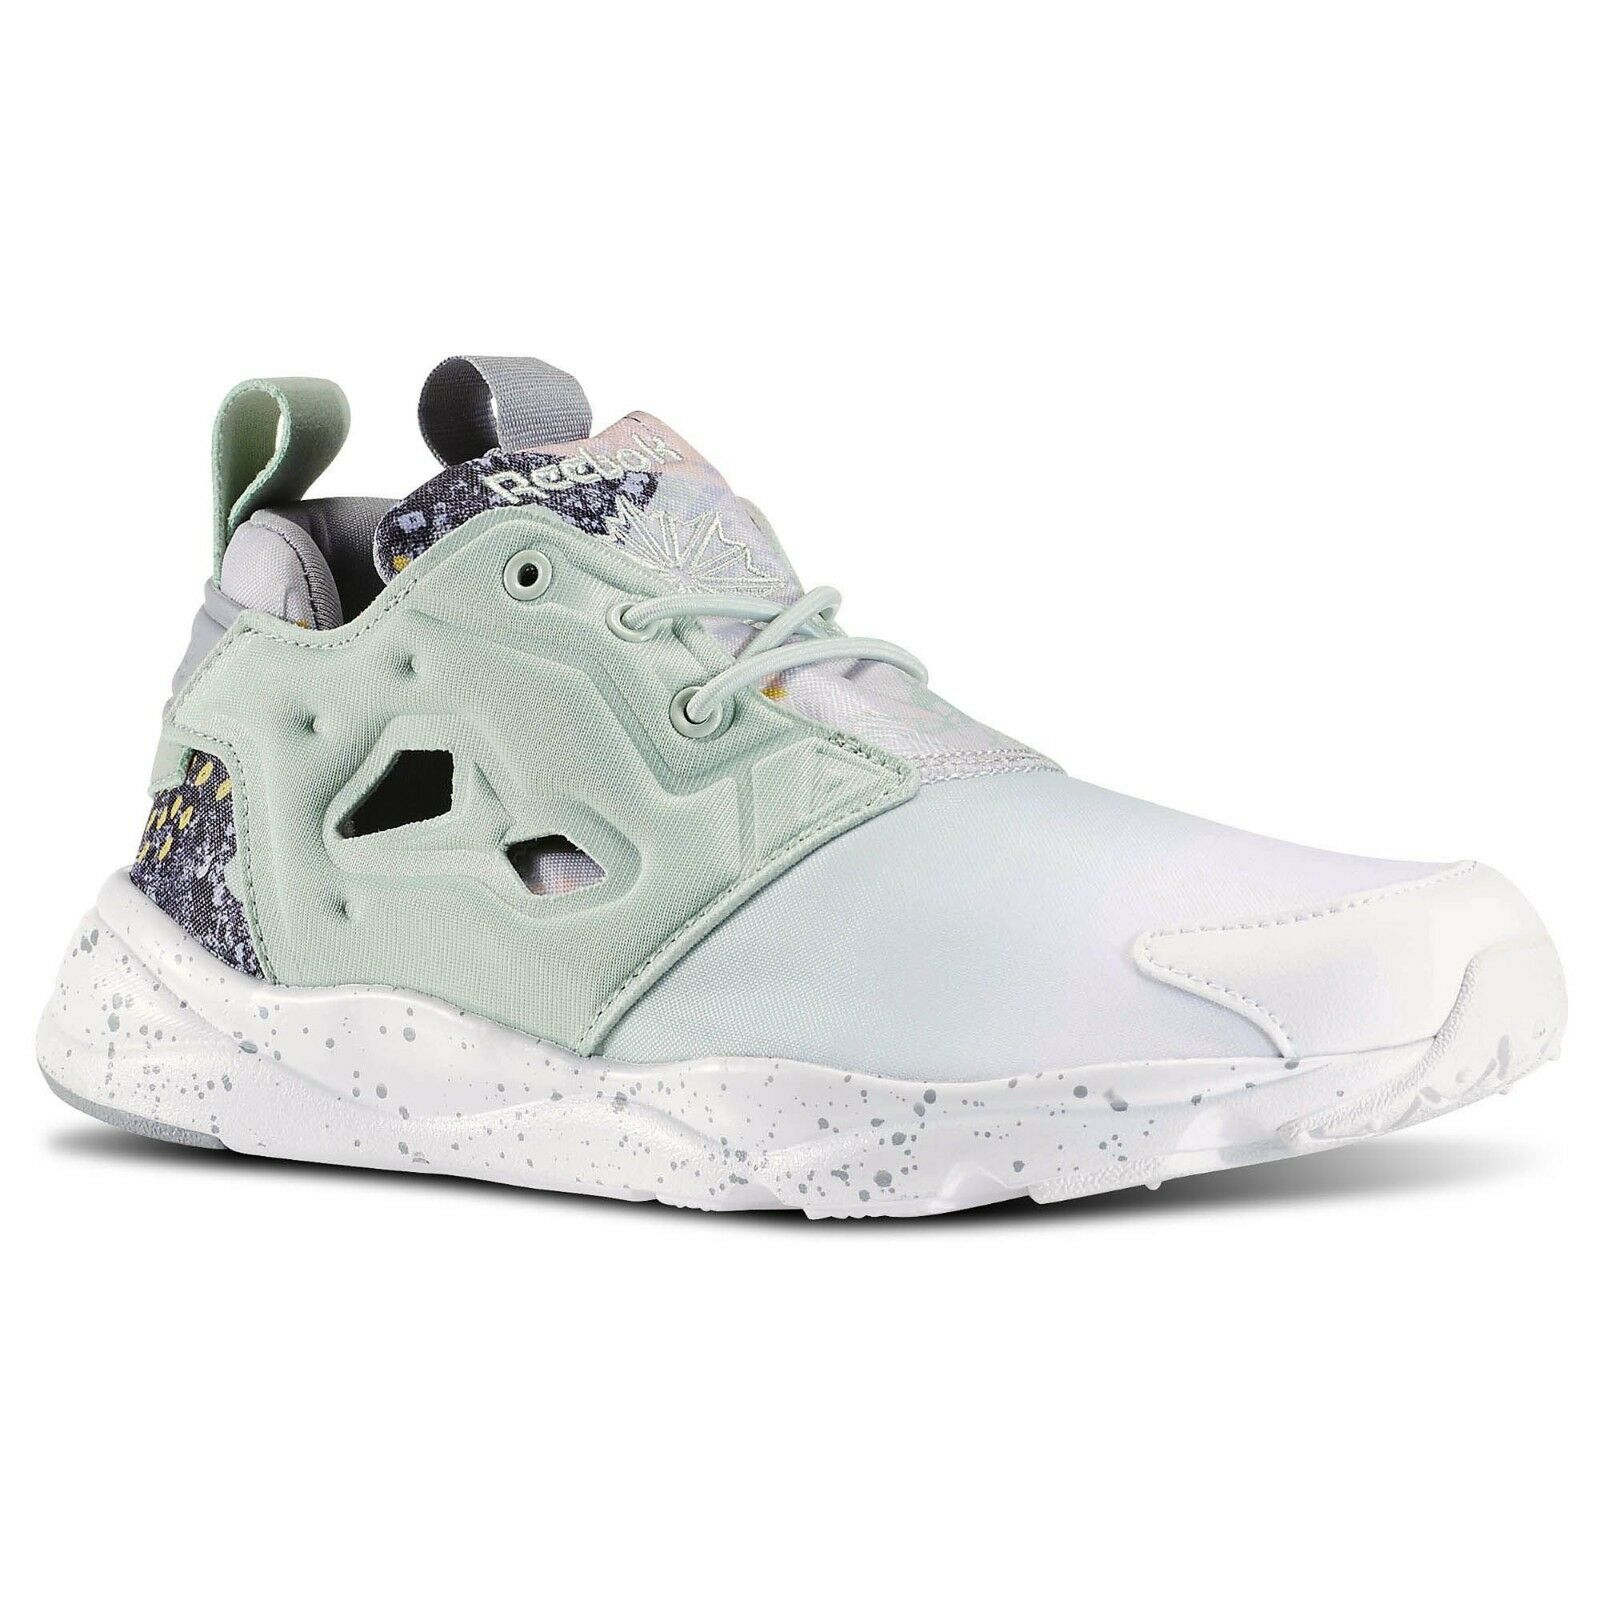 Reebok Women Furylite Contemporary Sage Mist White Tin Grey V69636 Sneakers